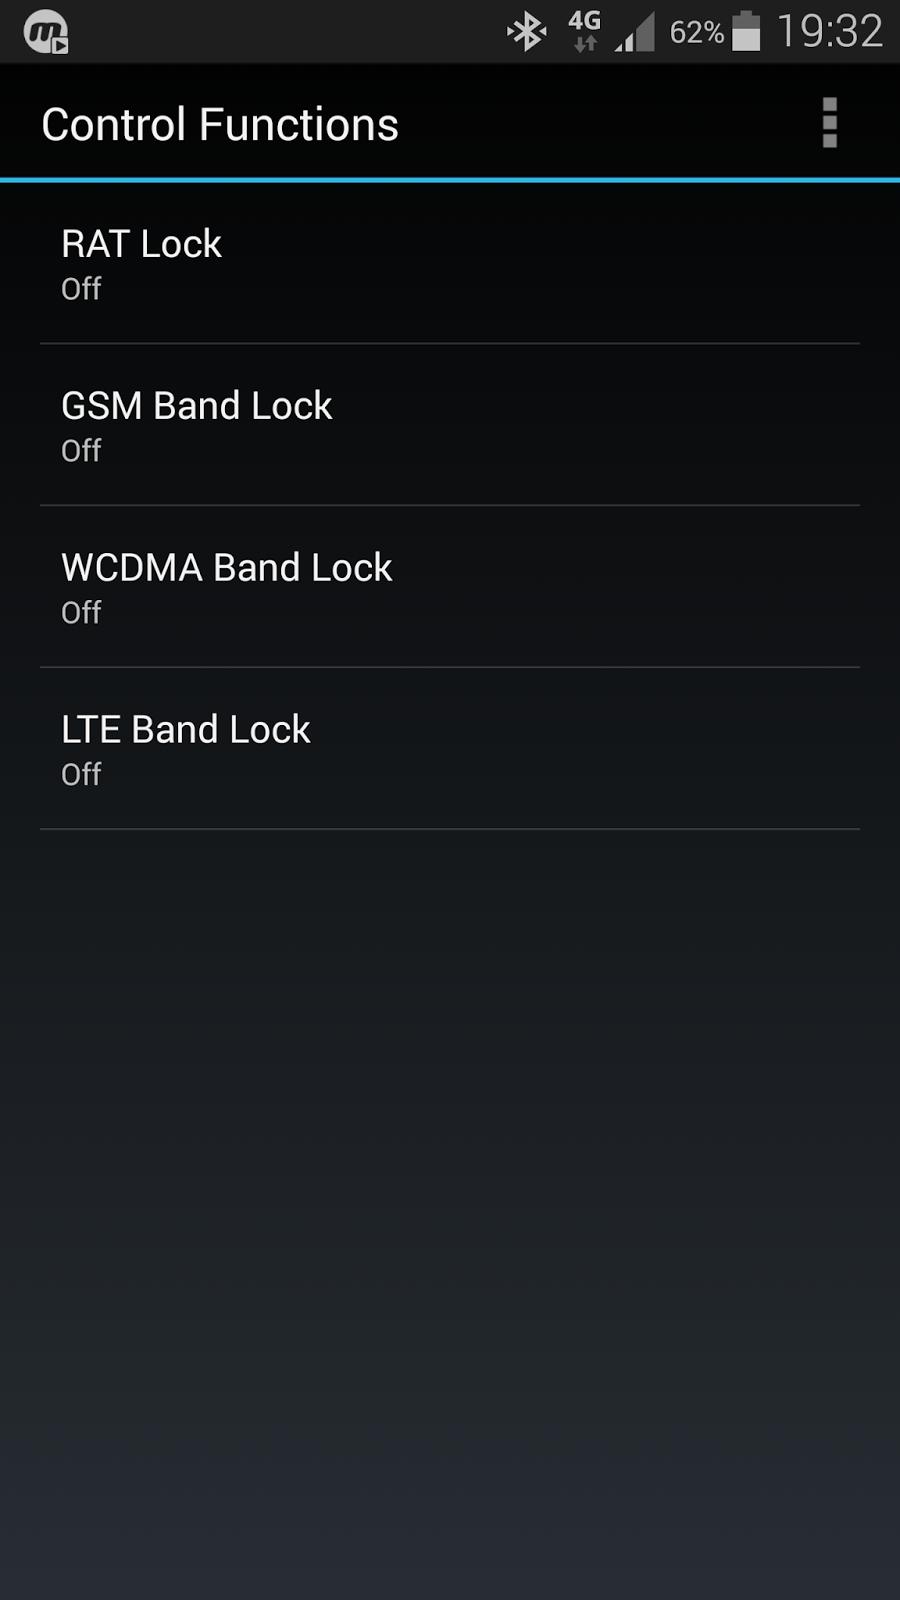 Drive Test Teleco: Tems Pocket Lock LTE900/LTE1800 dan 2G Secara